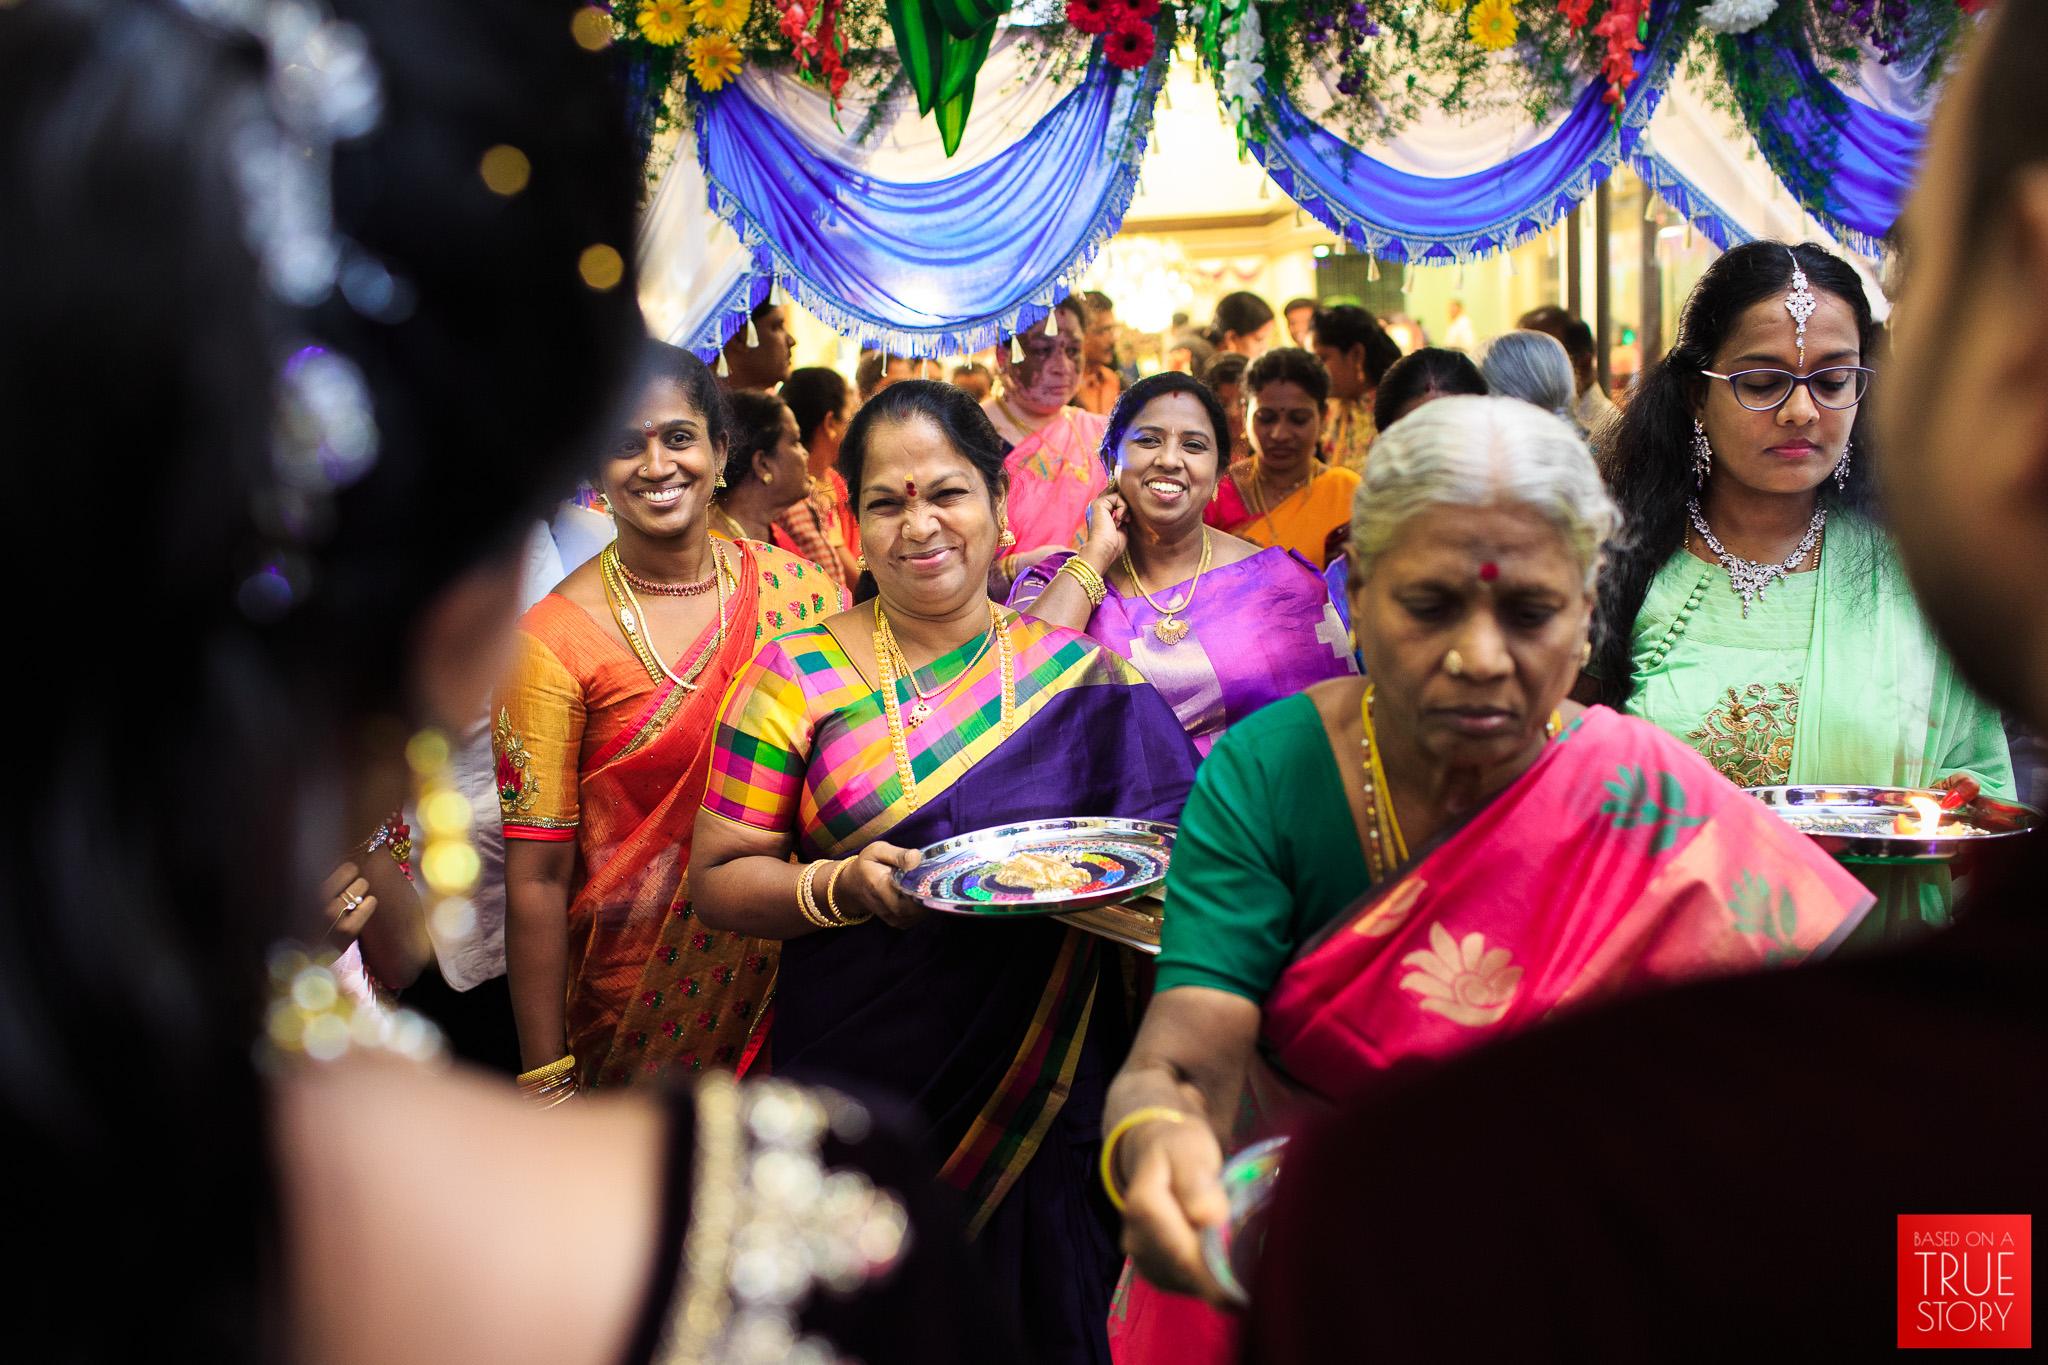 Tamil-Candid-Wedding-Photography-0013.jpg